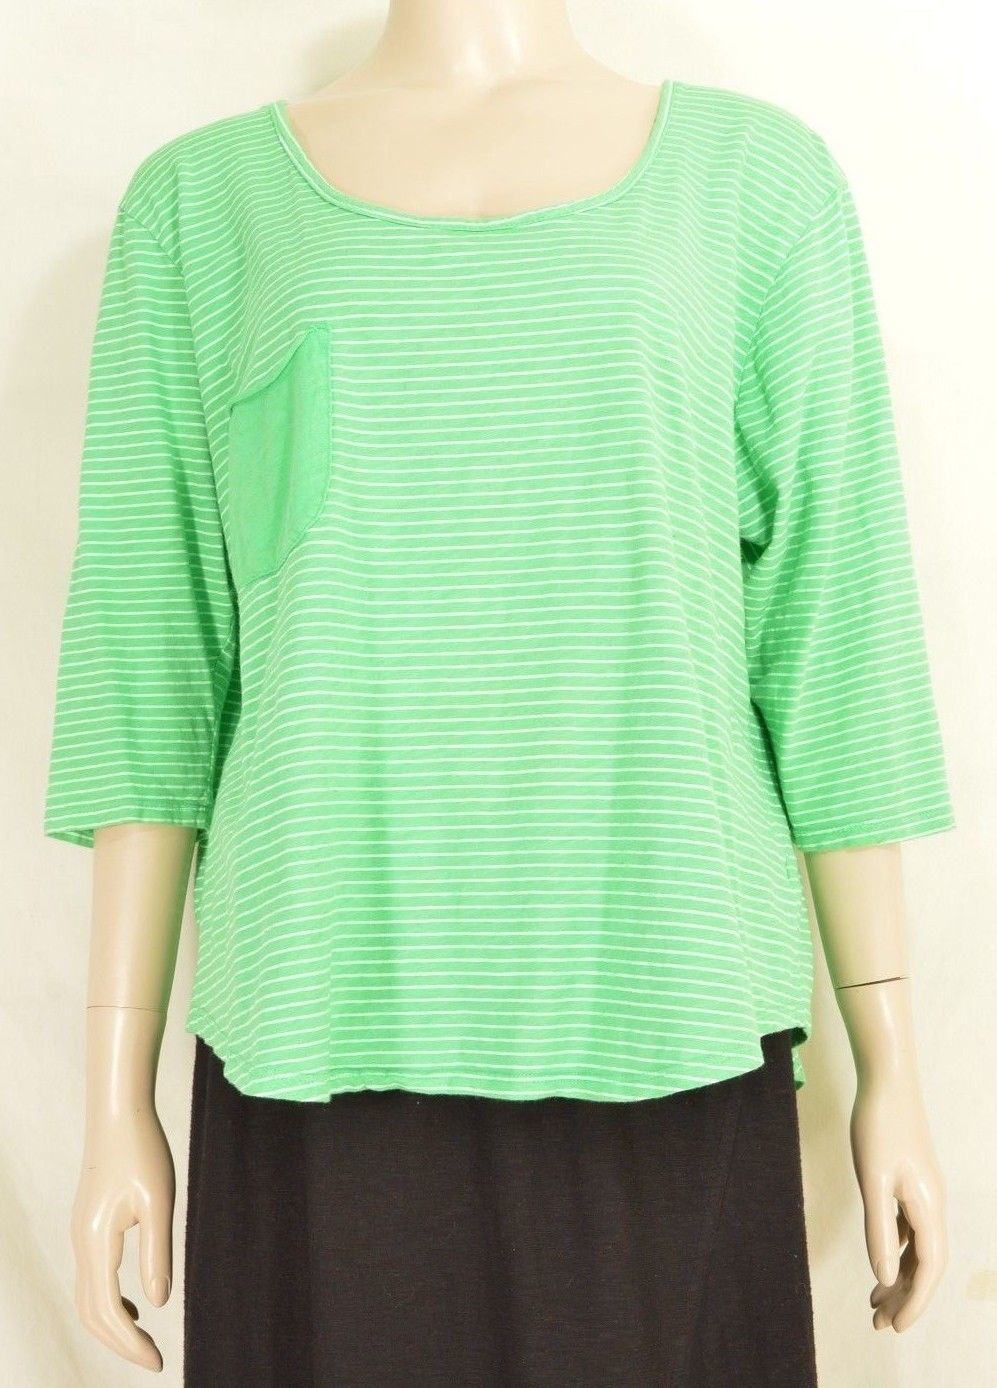 1 Fresh Produce top OSFM knit 3/4 sleeve green with tonal green stripes USA 13